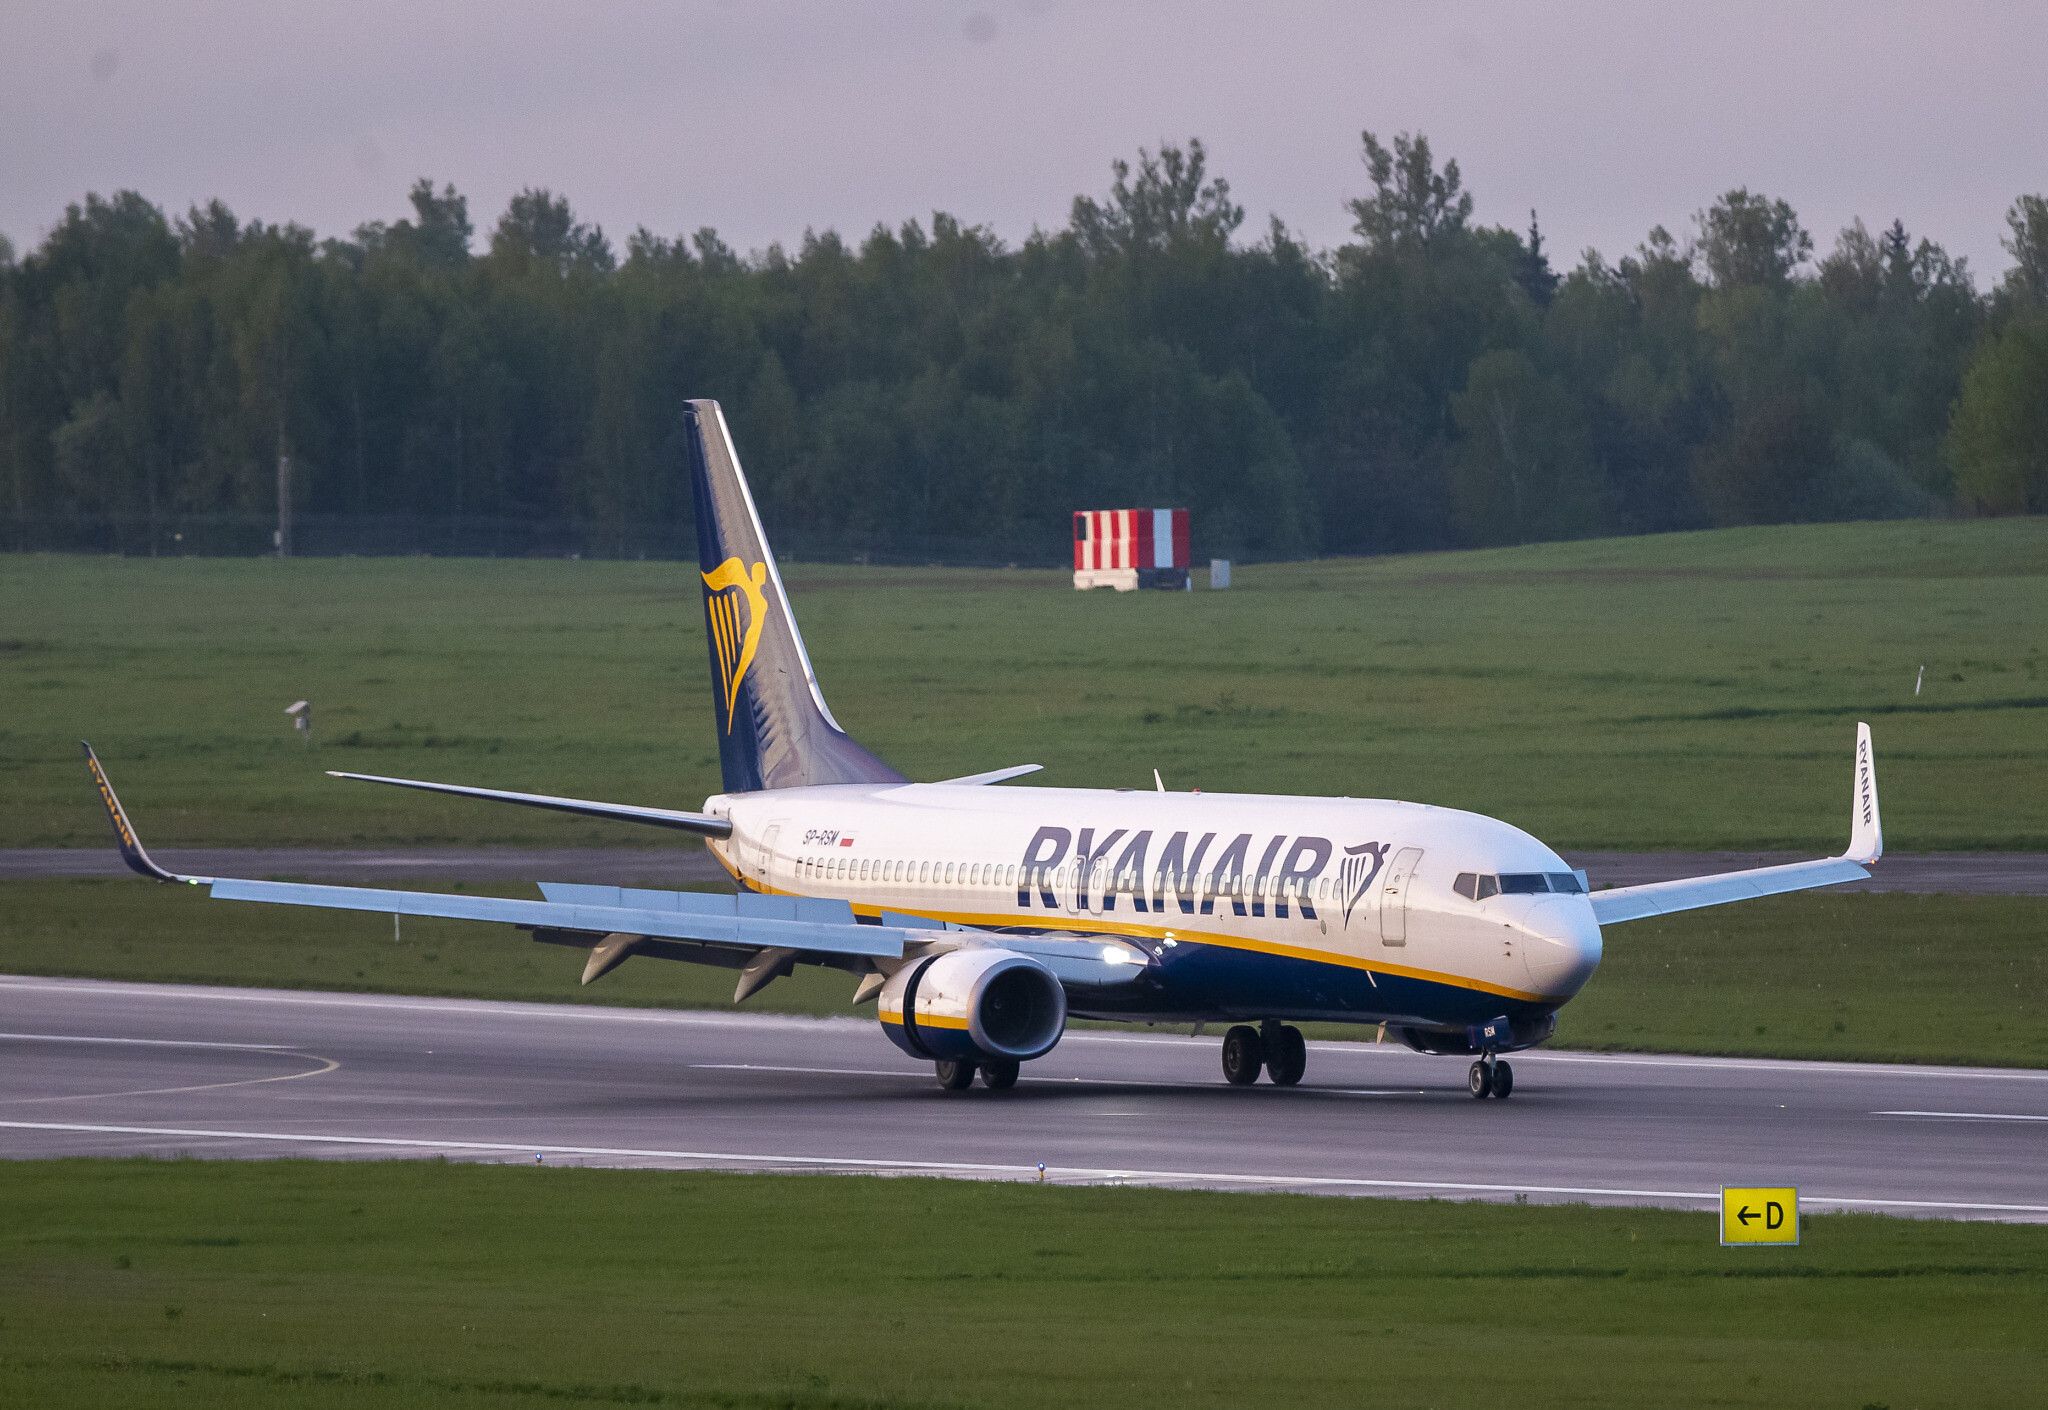 Lithuania, UK, Ukraine restrict flights from crossing Belarus airspace